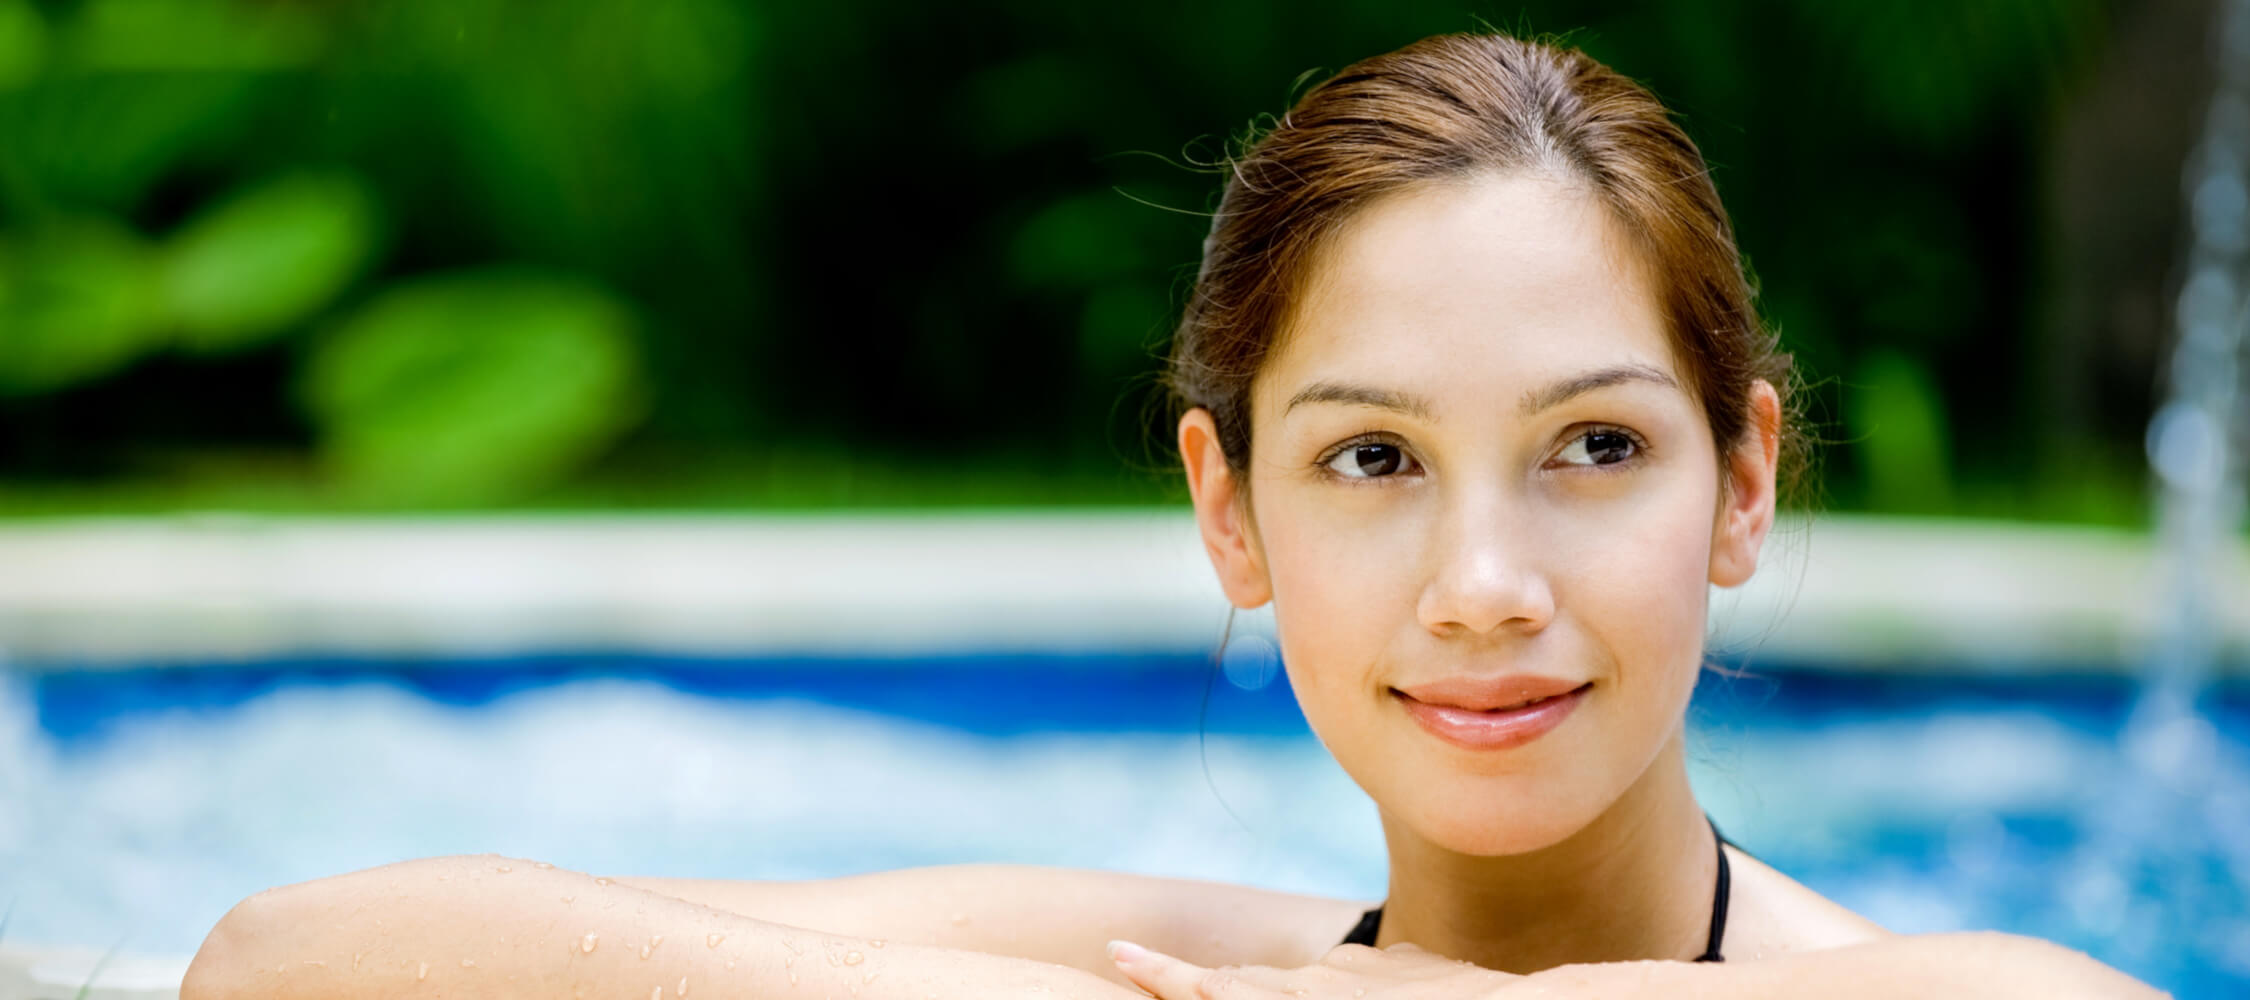 Hotel-Villa-Laurus-Merano-Wellness-Garten-Pool-Detail-23268892_L-2250x1000